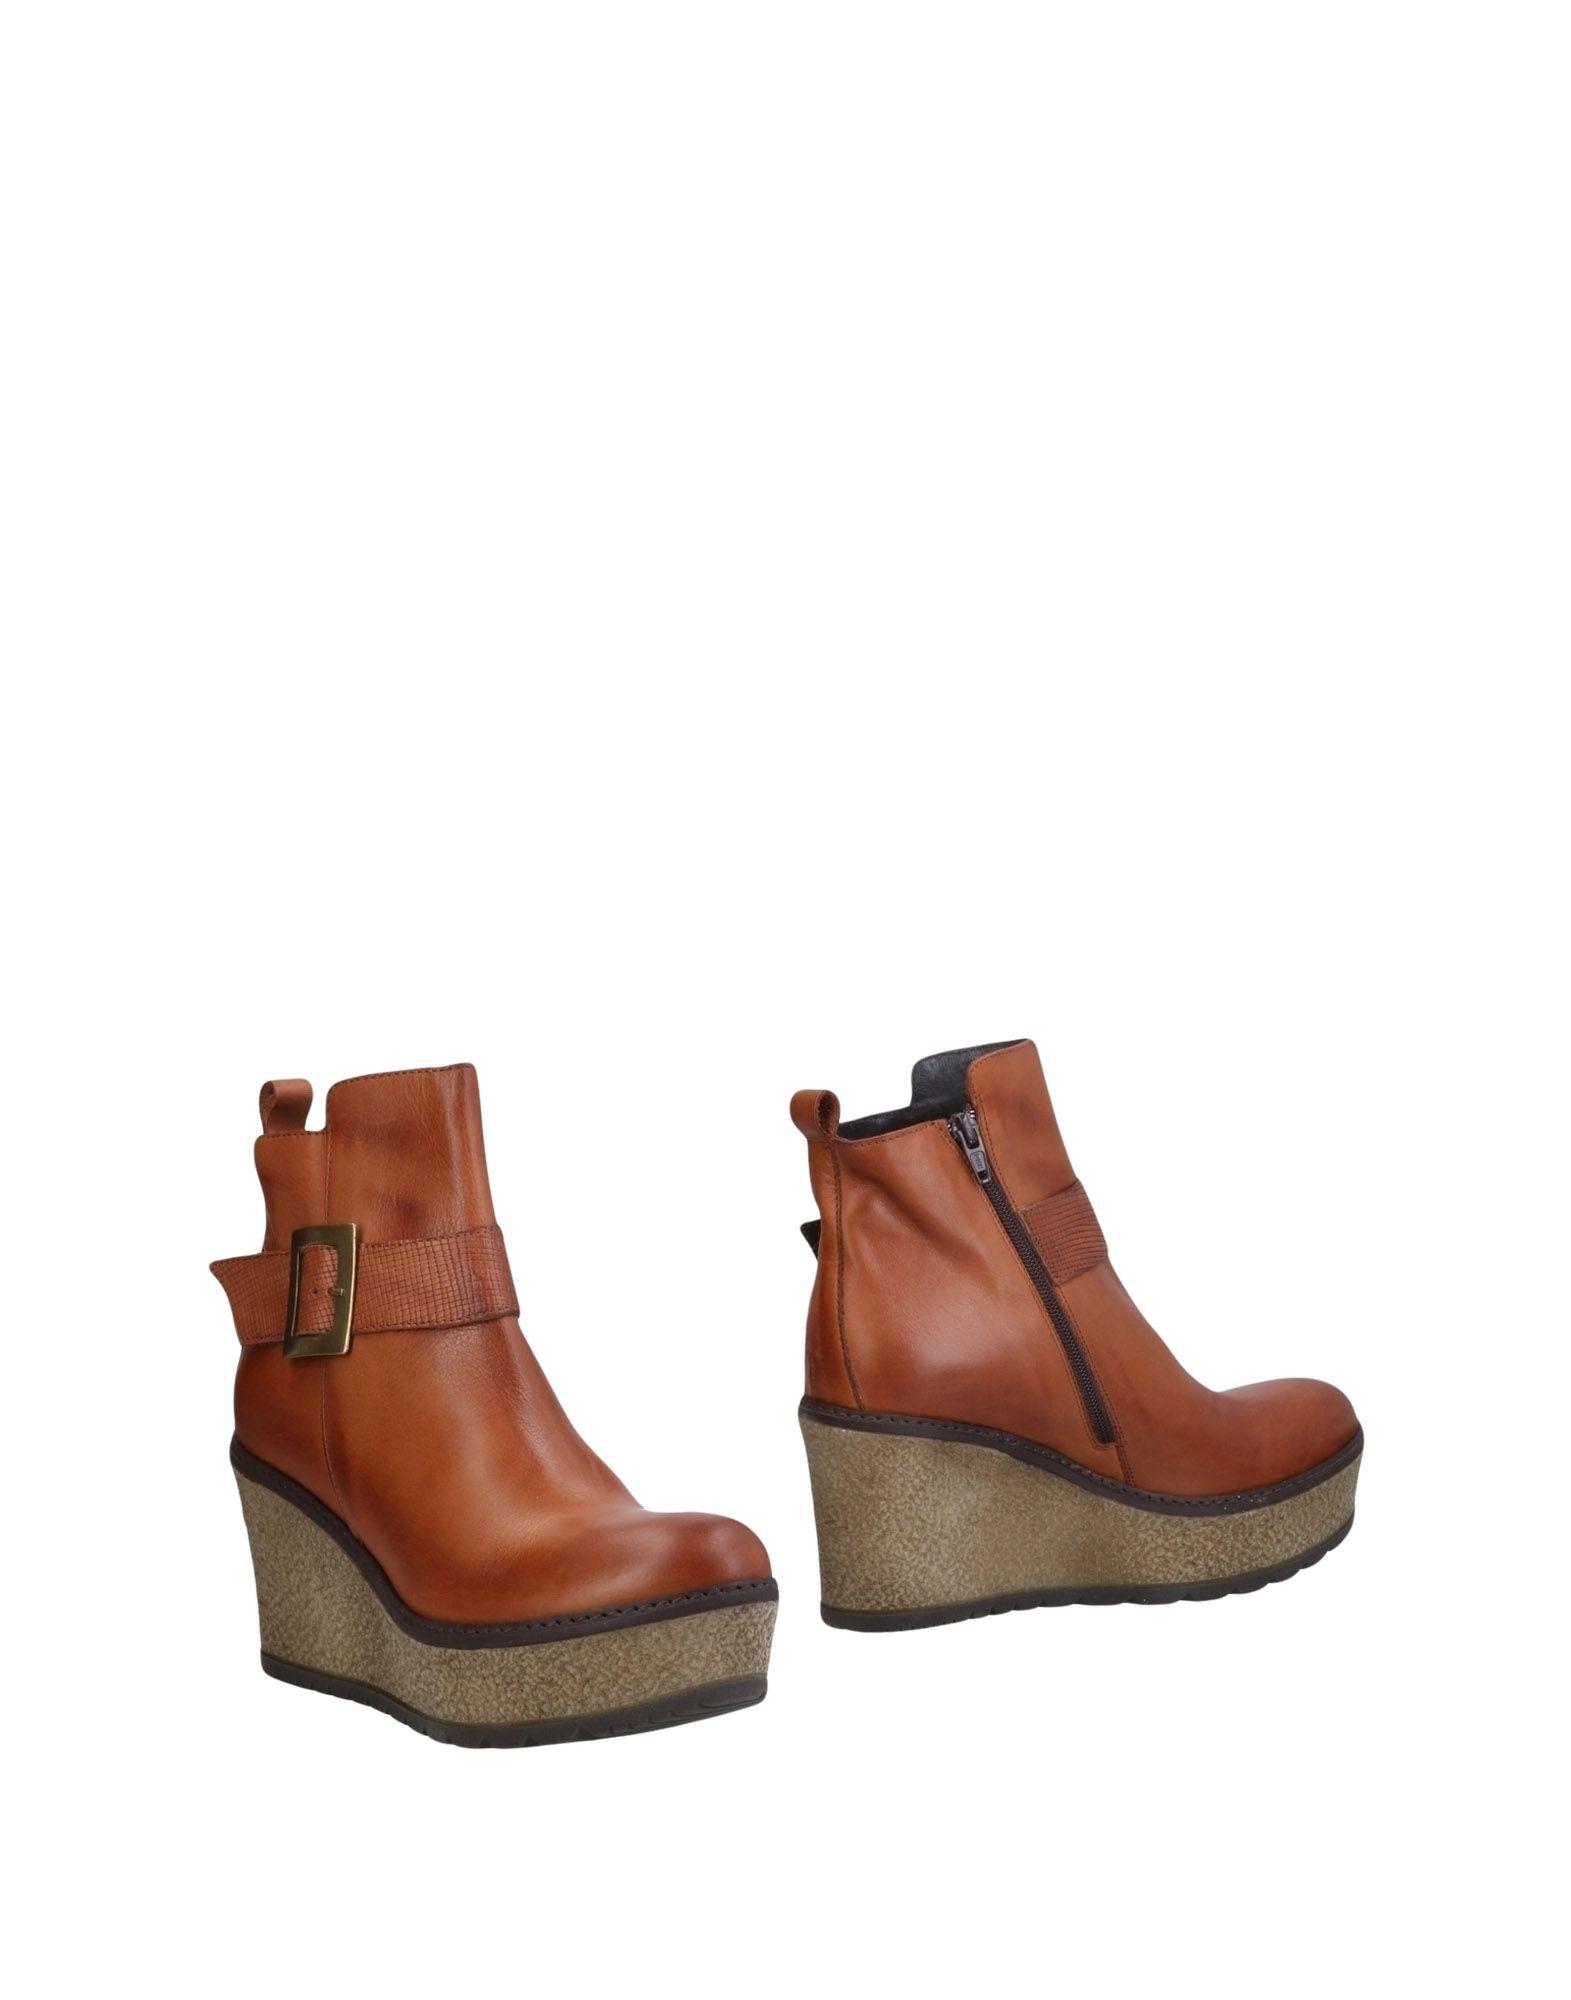 Tsd12 Stiefelette Damen  11454167MM 11454167MM 11454167MM Gute Qualität beliebte Schuhe 611864